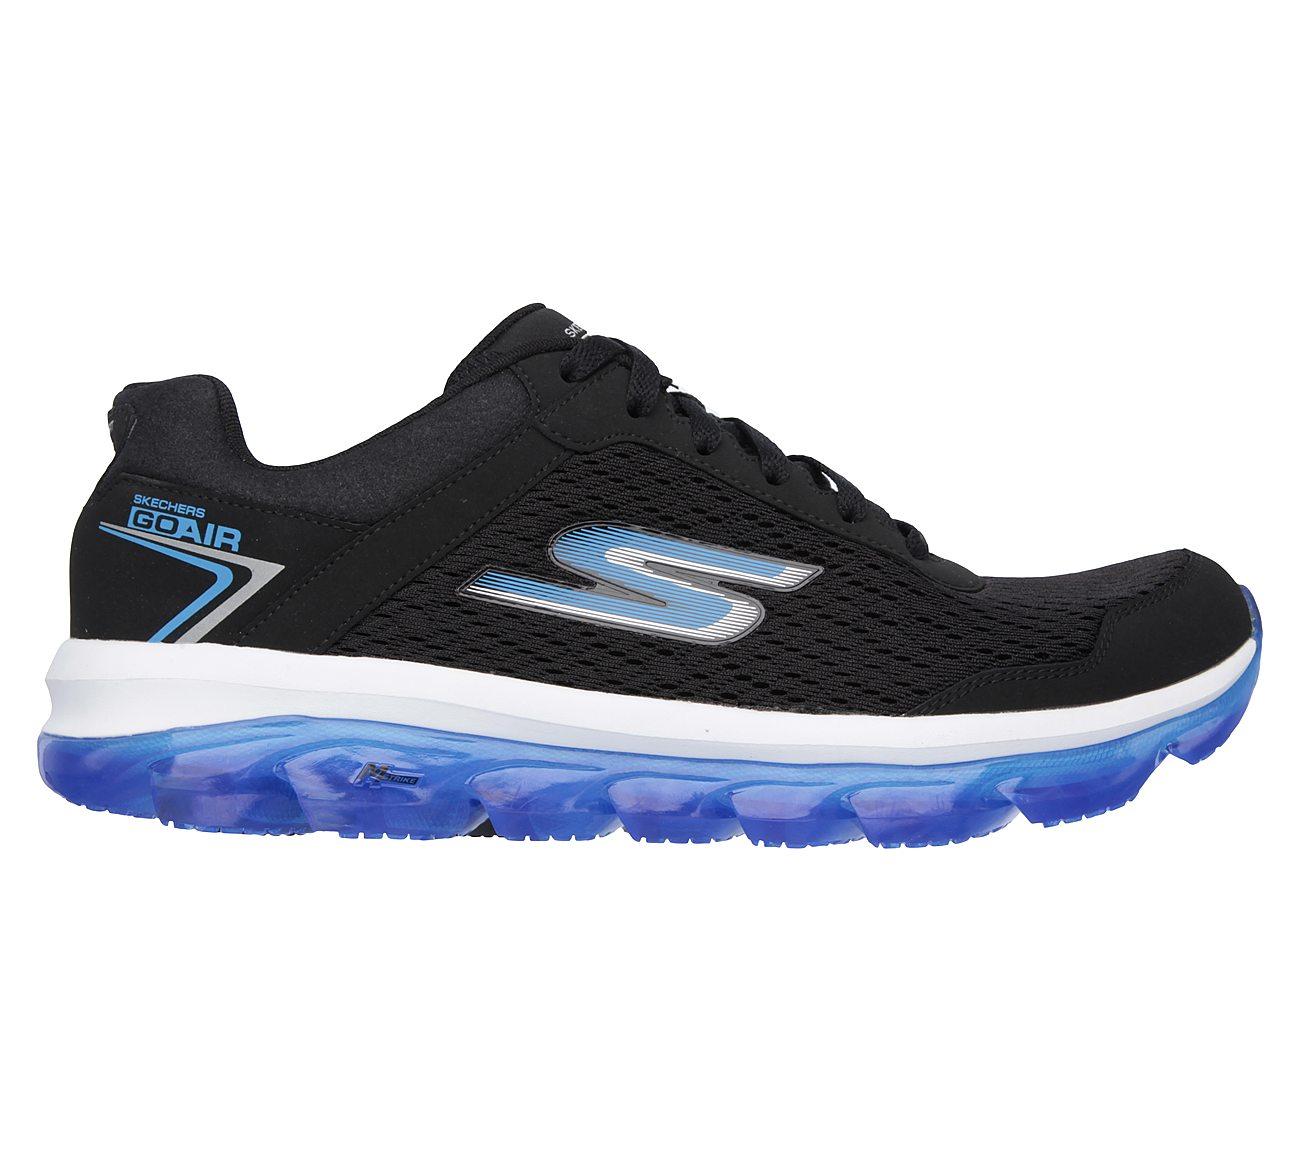 Buy SKECHERS Skechers GOair Skechers Performance Shoes r0uki